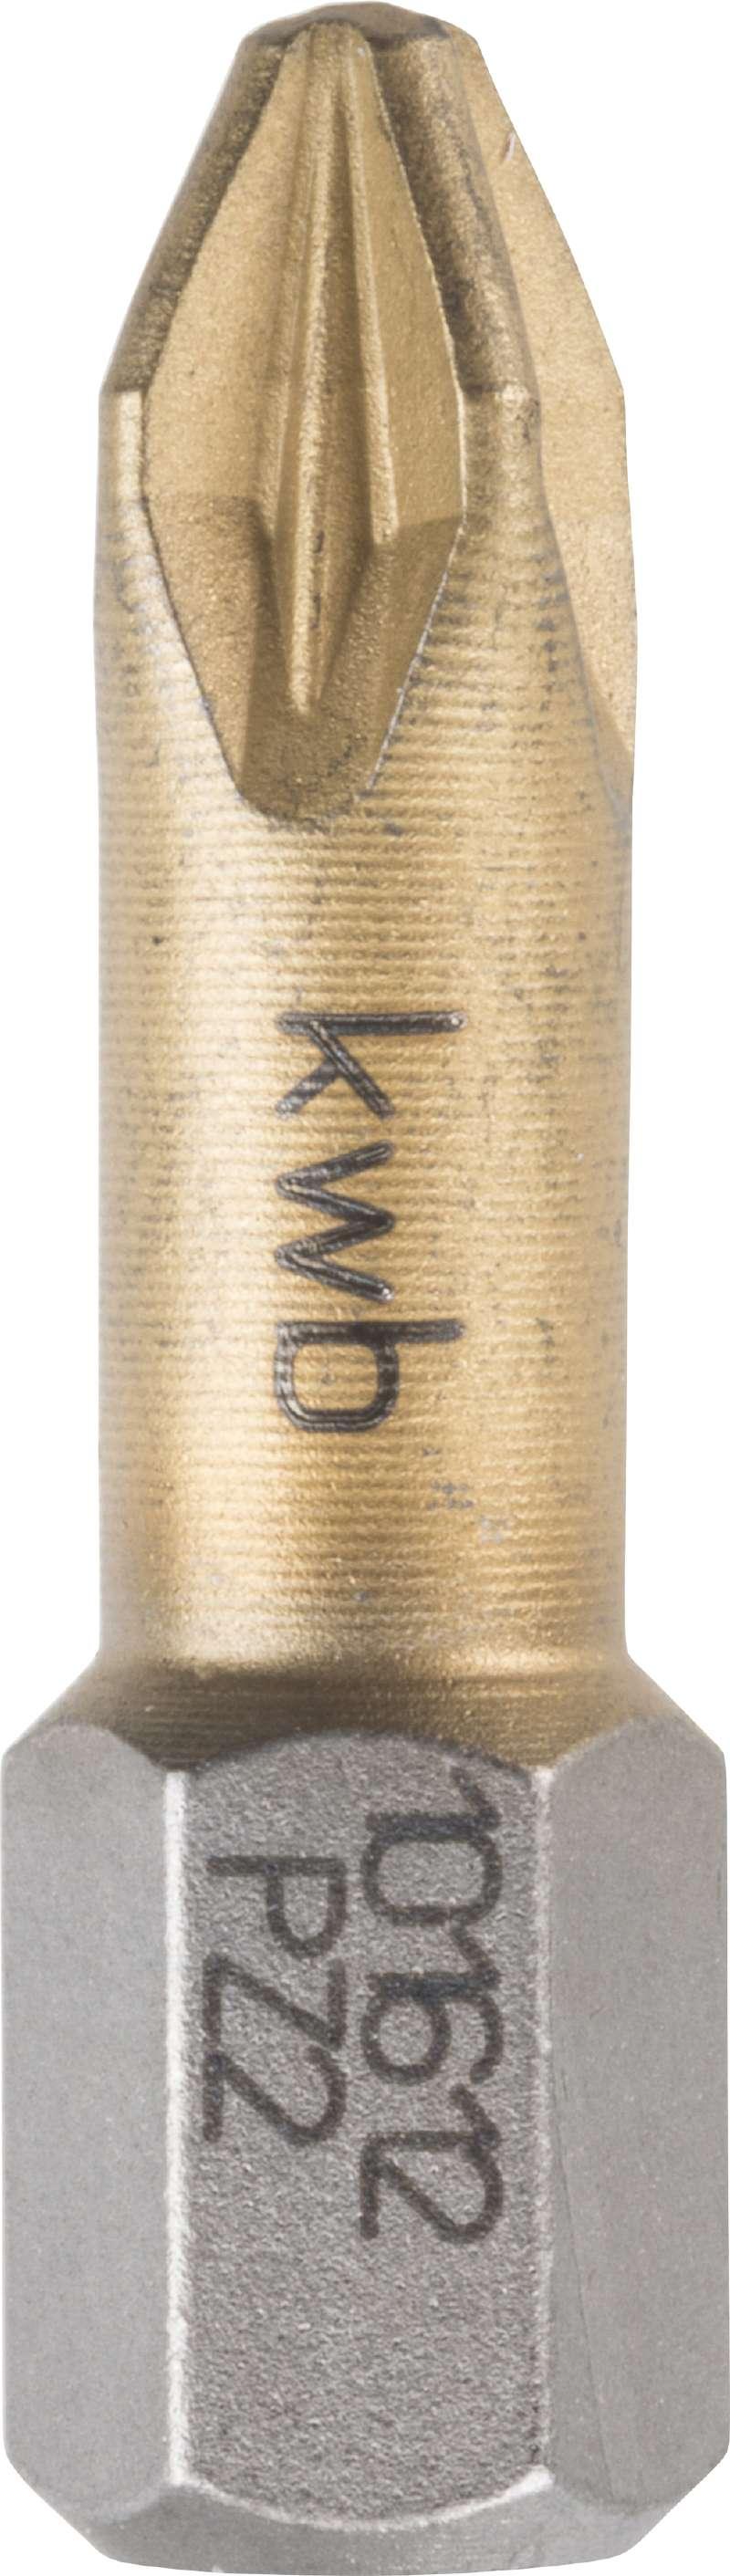 Бита Kwb 1016-02 бита kwb 1018 07